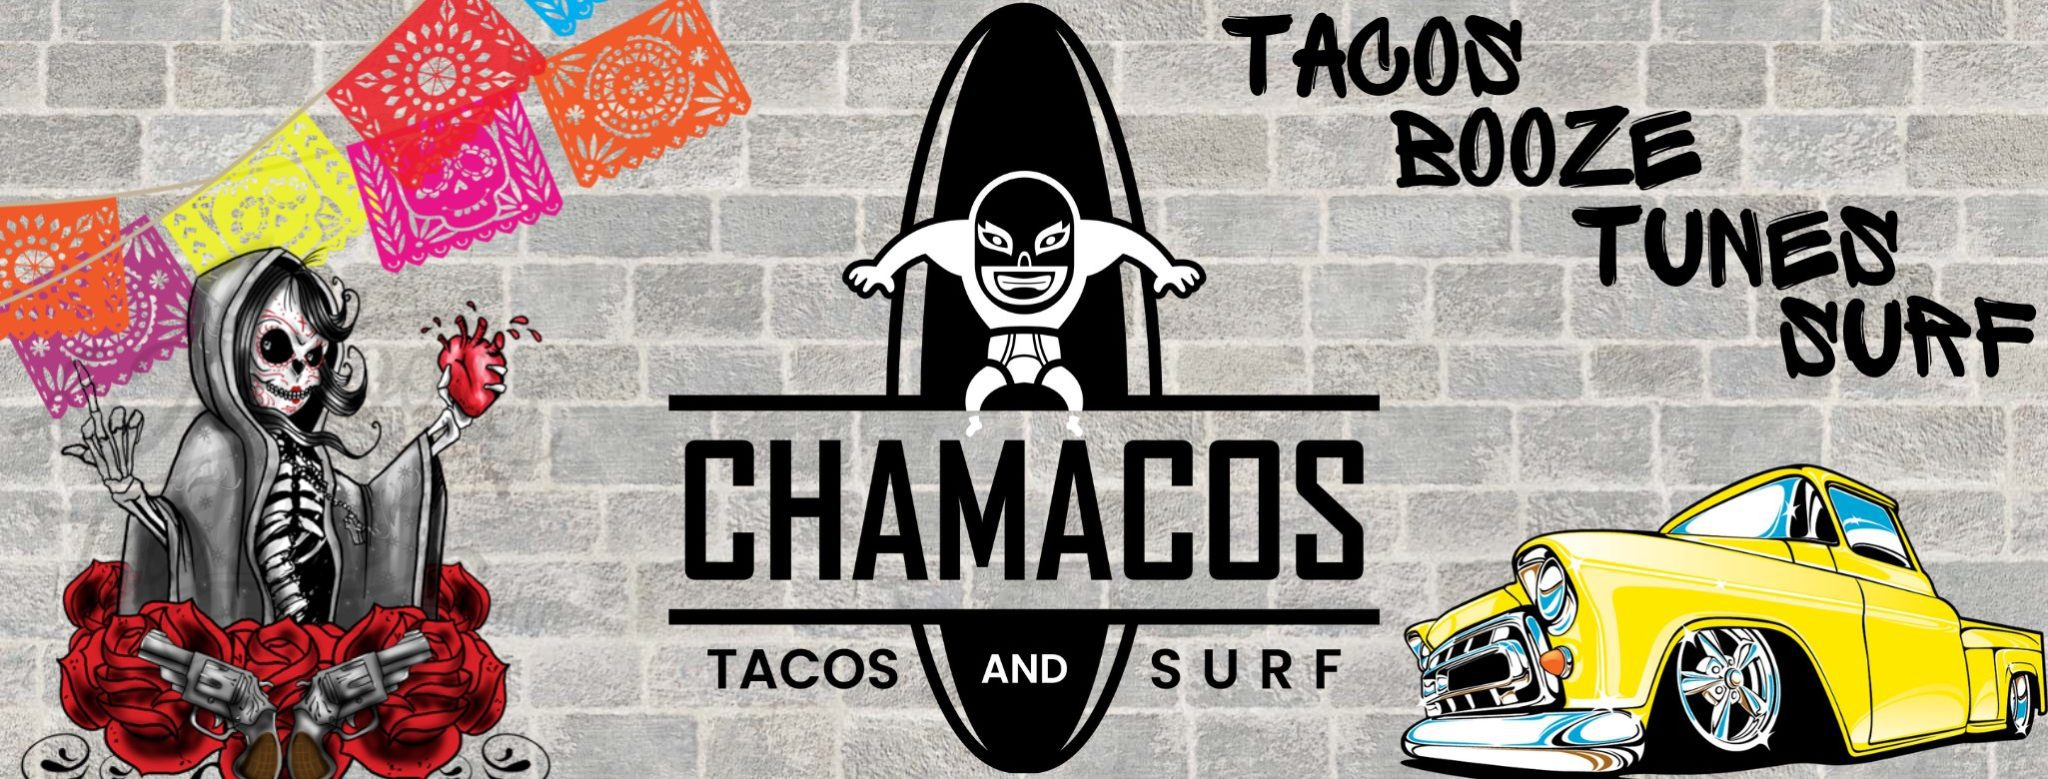 Chamacos Tacos Tybee Island